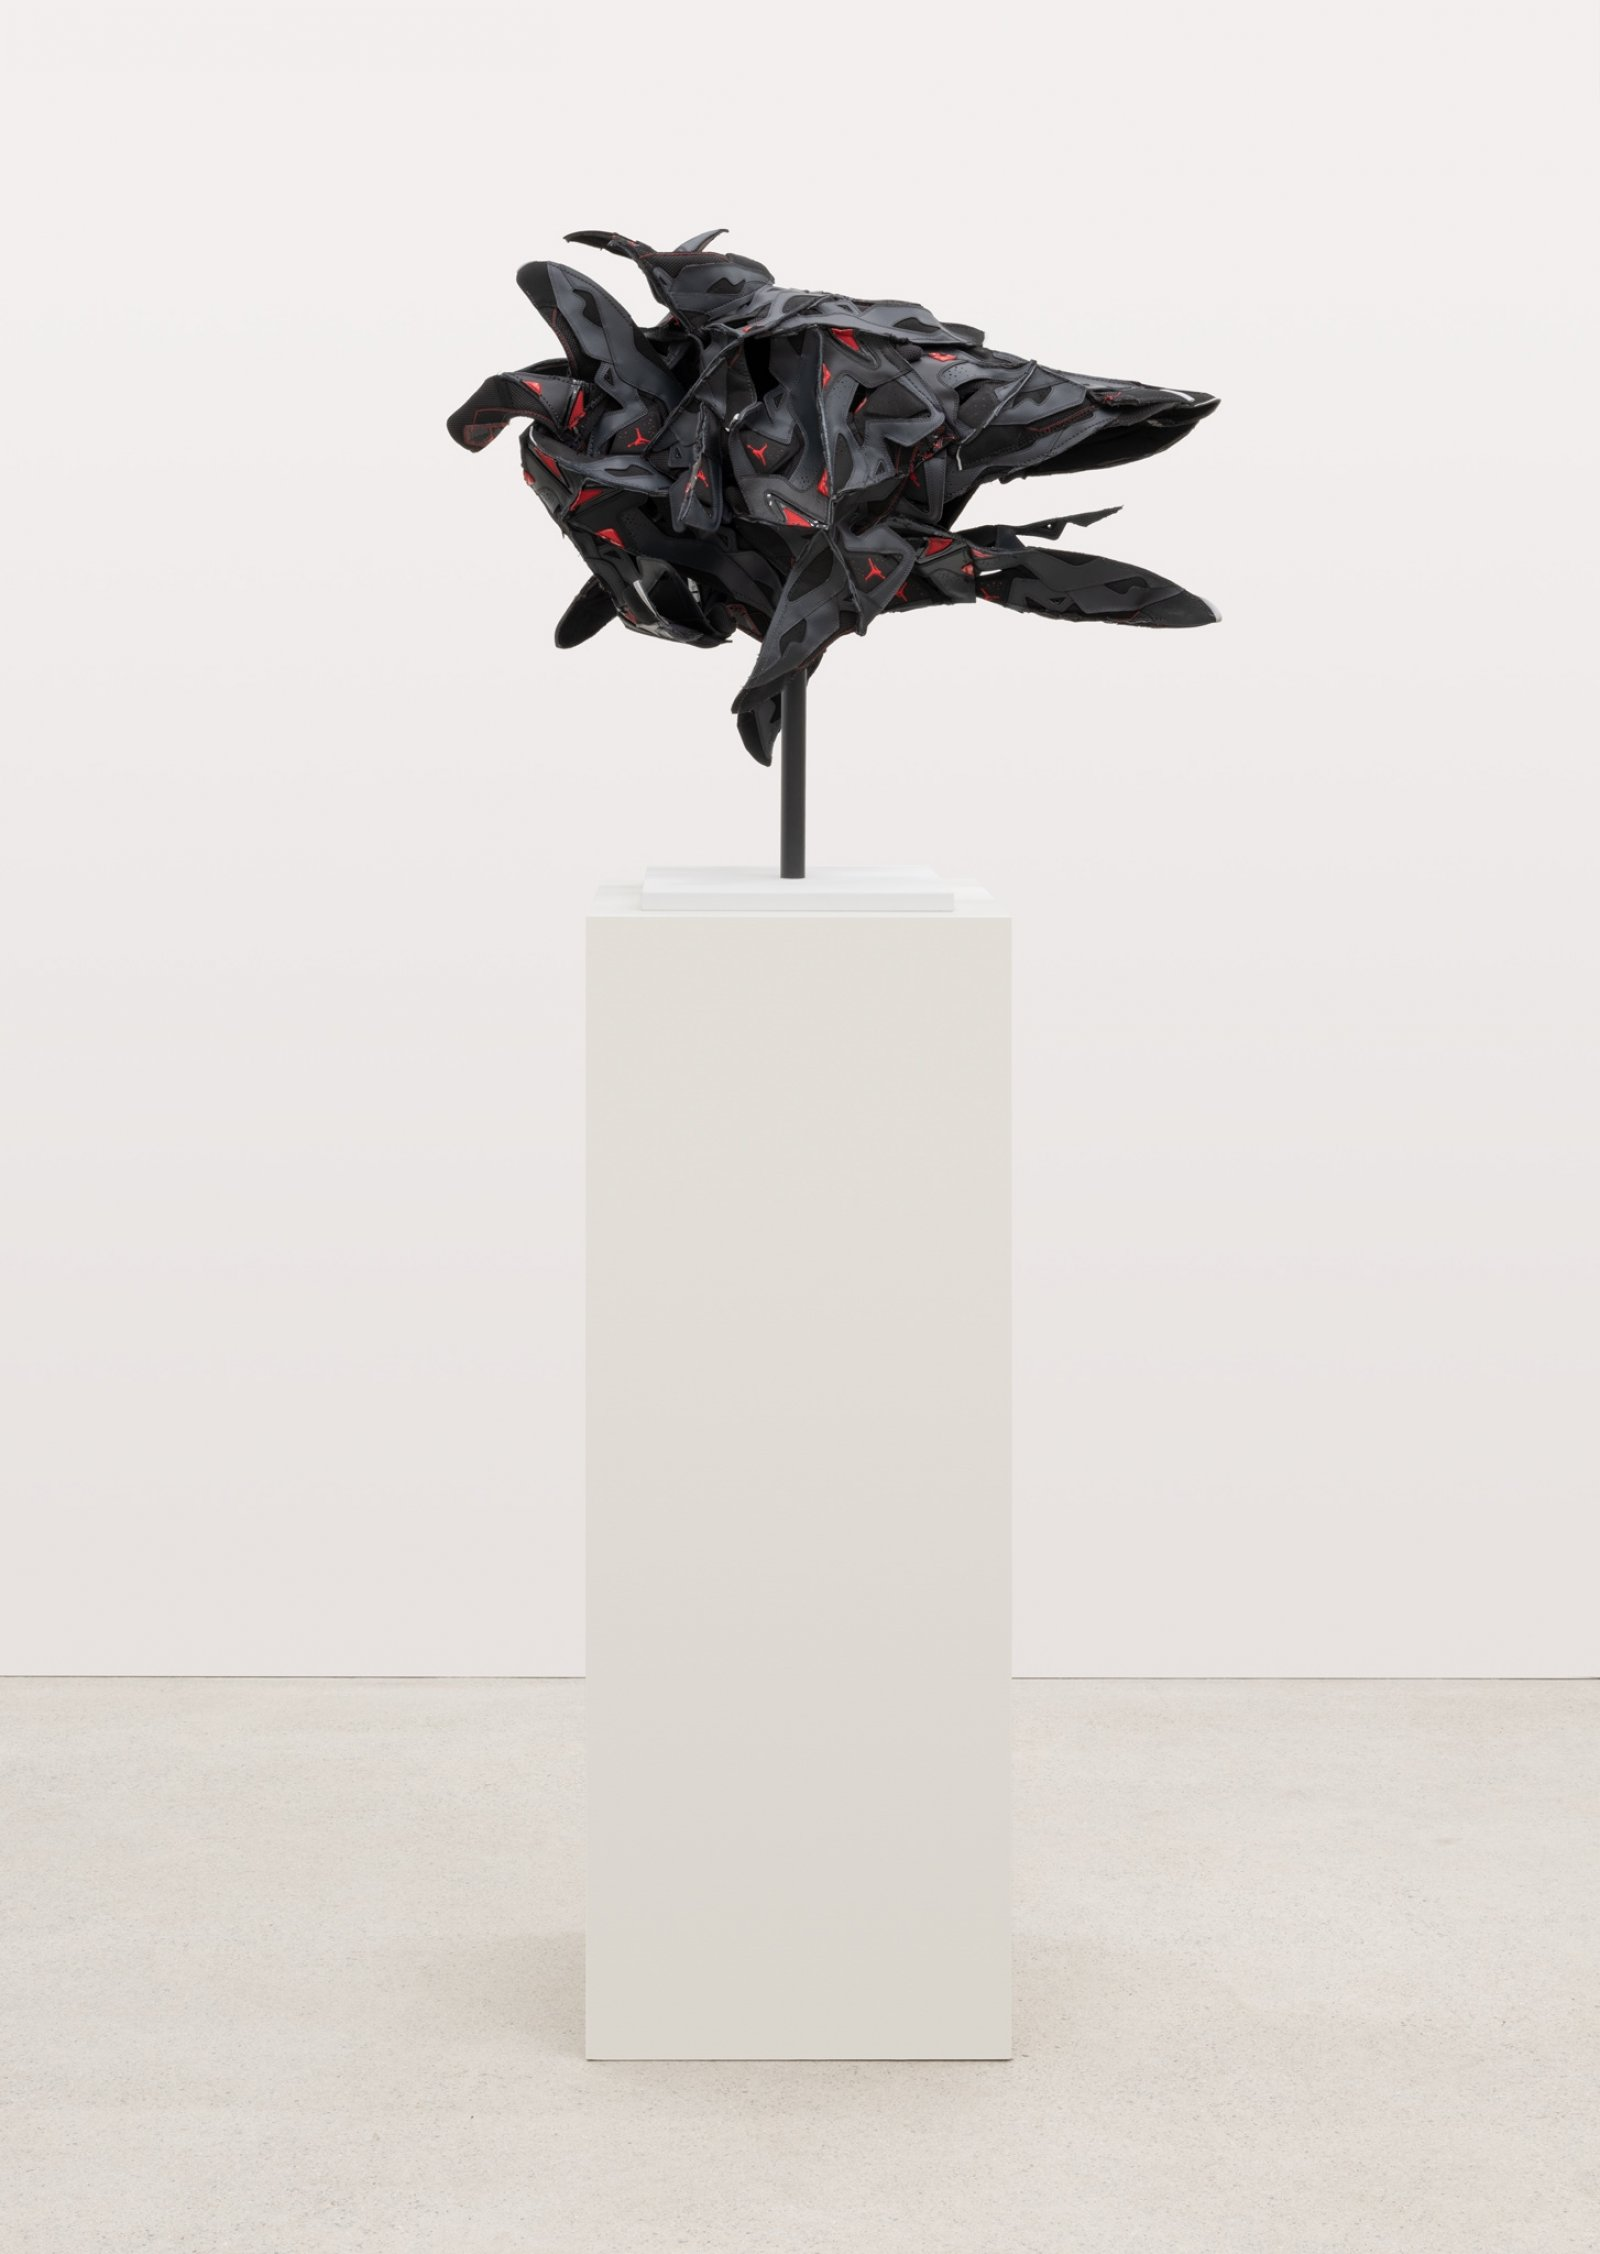 Brian Jungen, Intimidation Mask, 2018, nike air jordans, copper, 27 x 36 x 19 in. (69 x 91 x 48 cm)